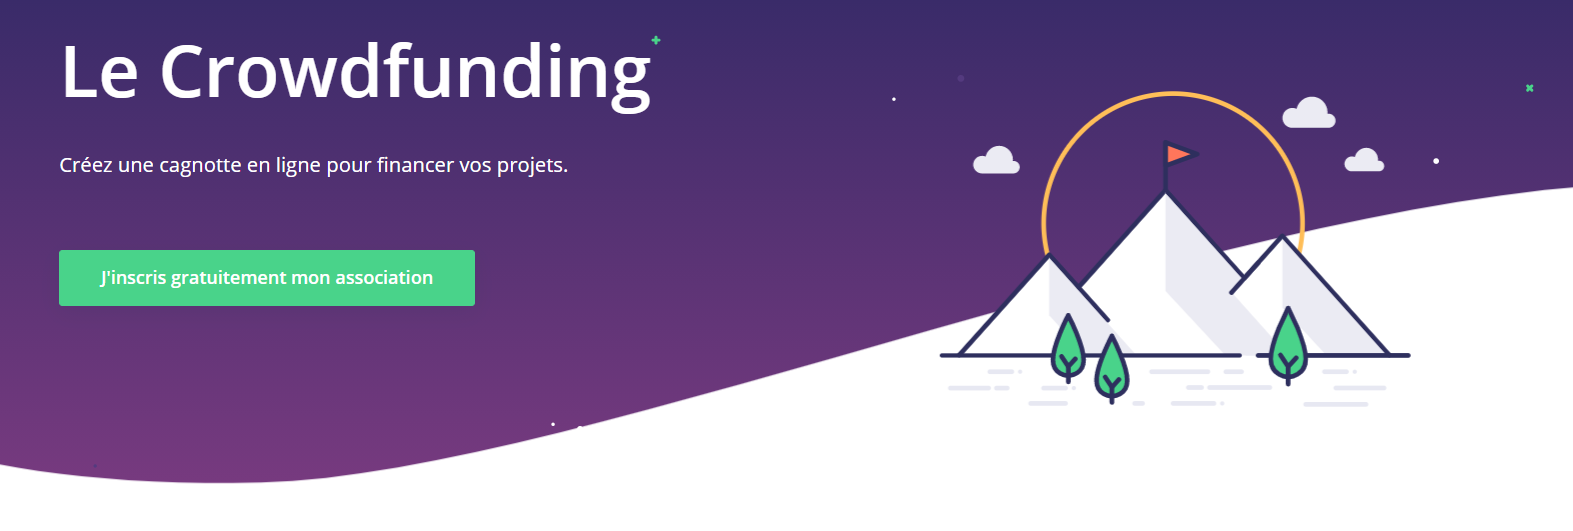 crowdfunding helloasso